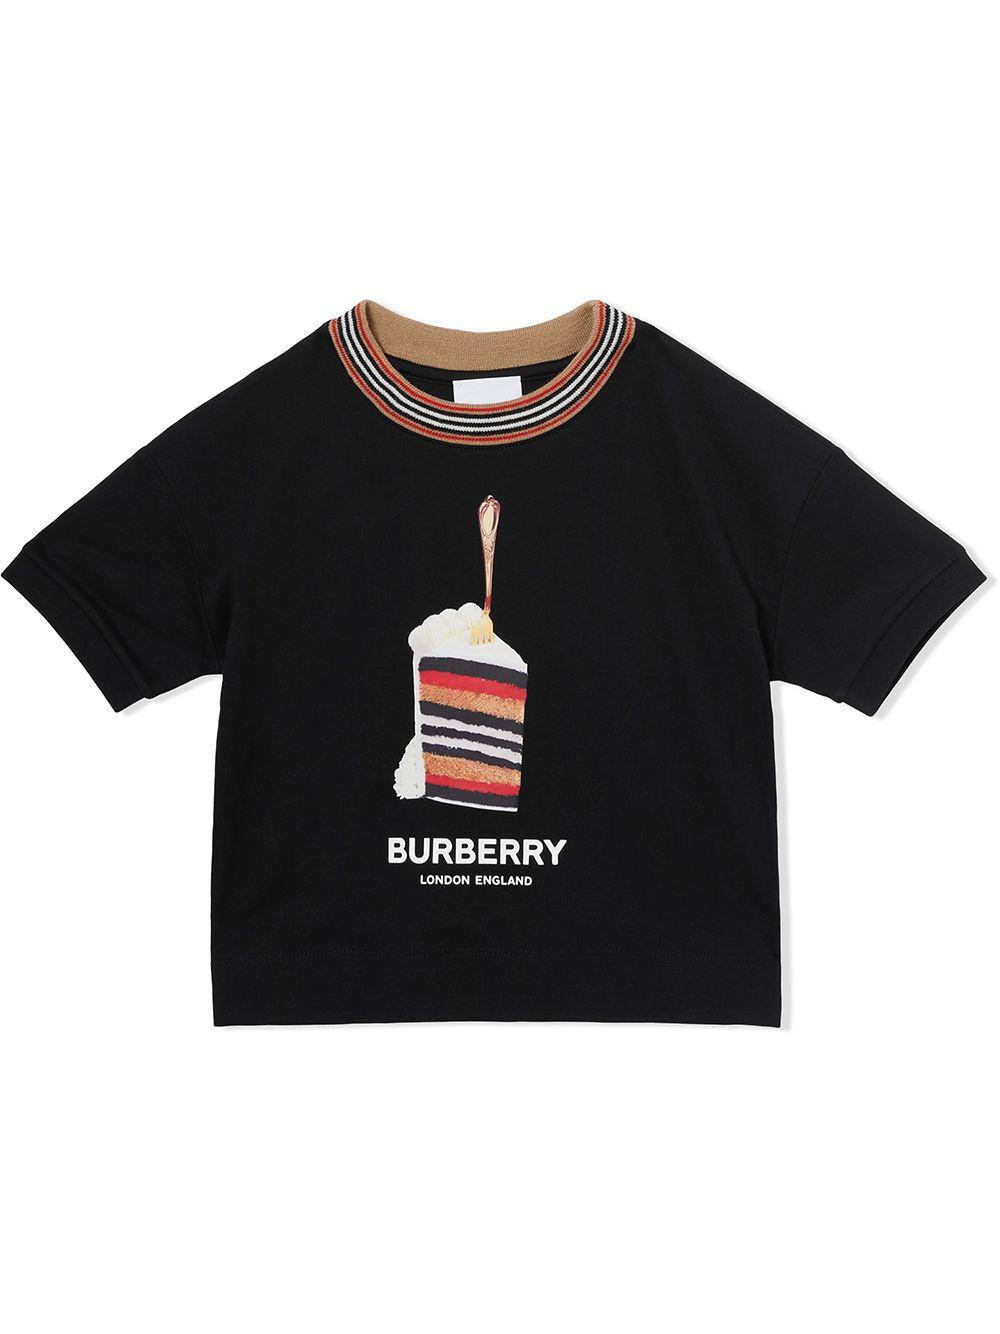 BURBERRY KIDS |  | 8036920A1189#